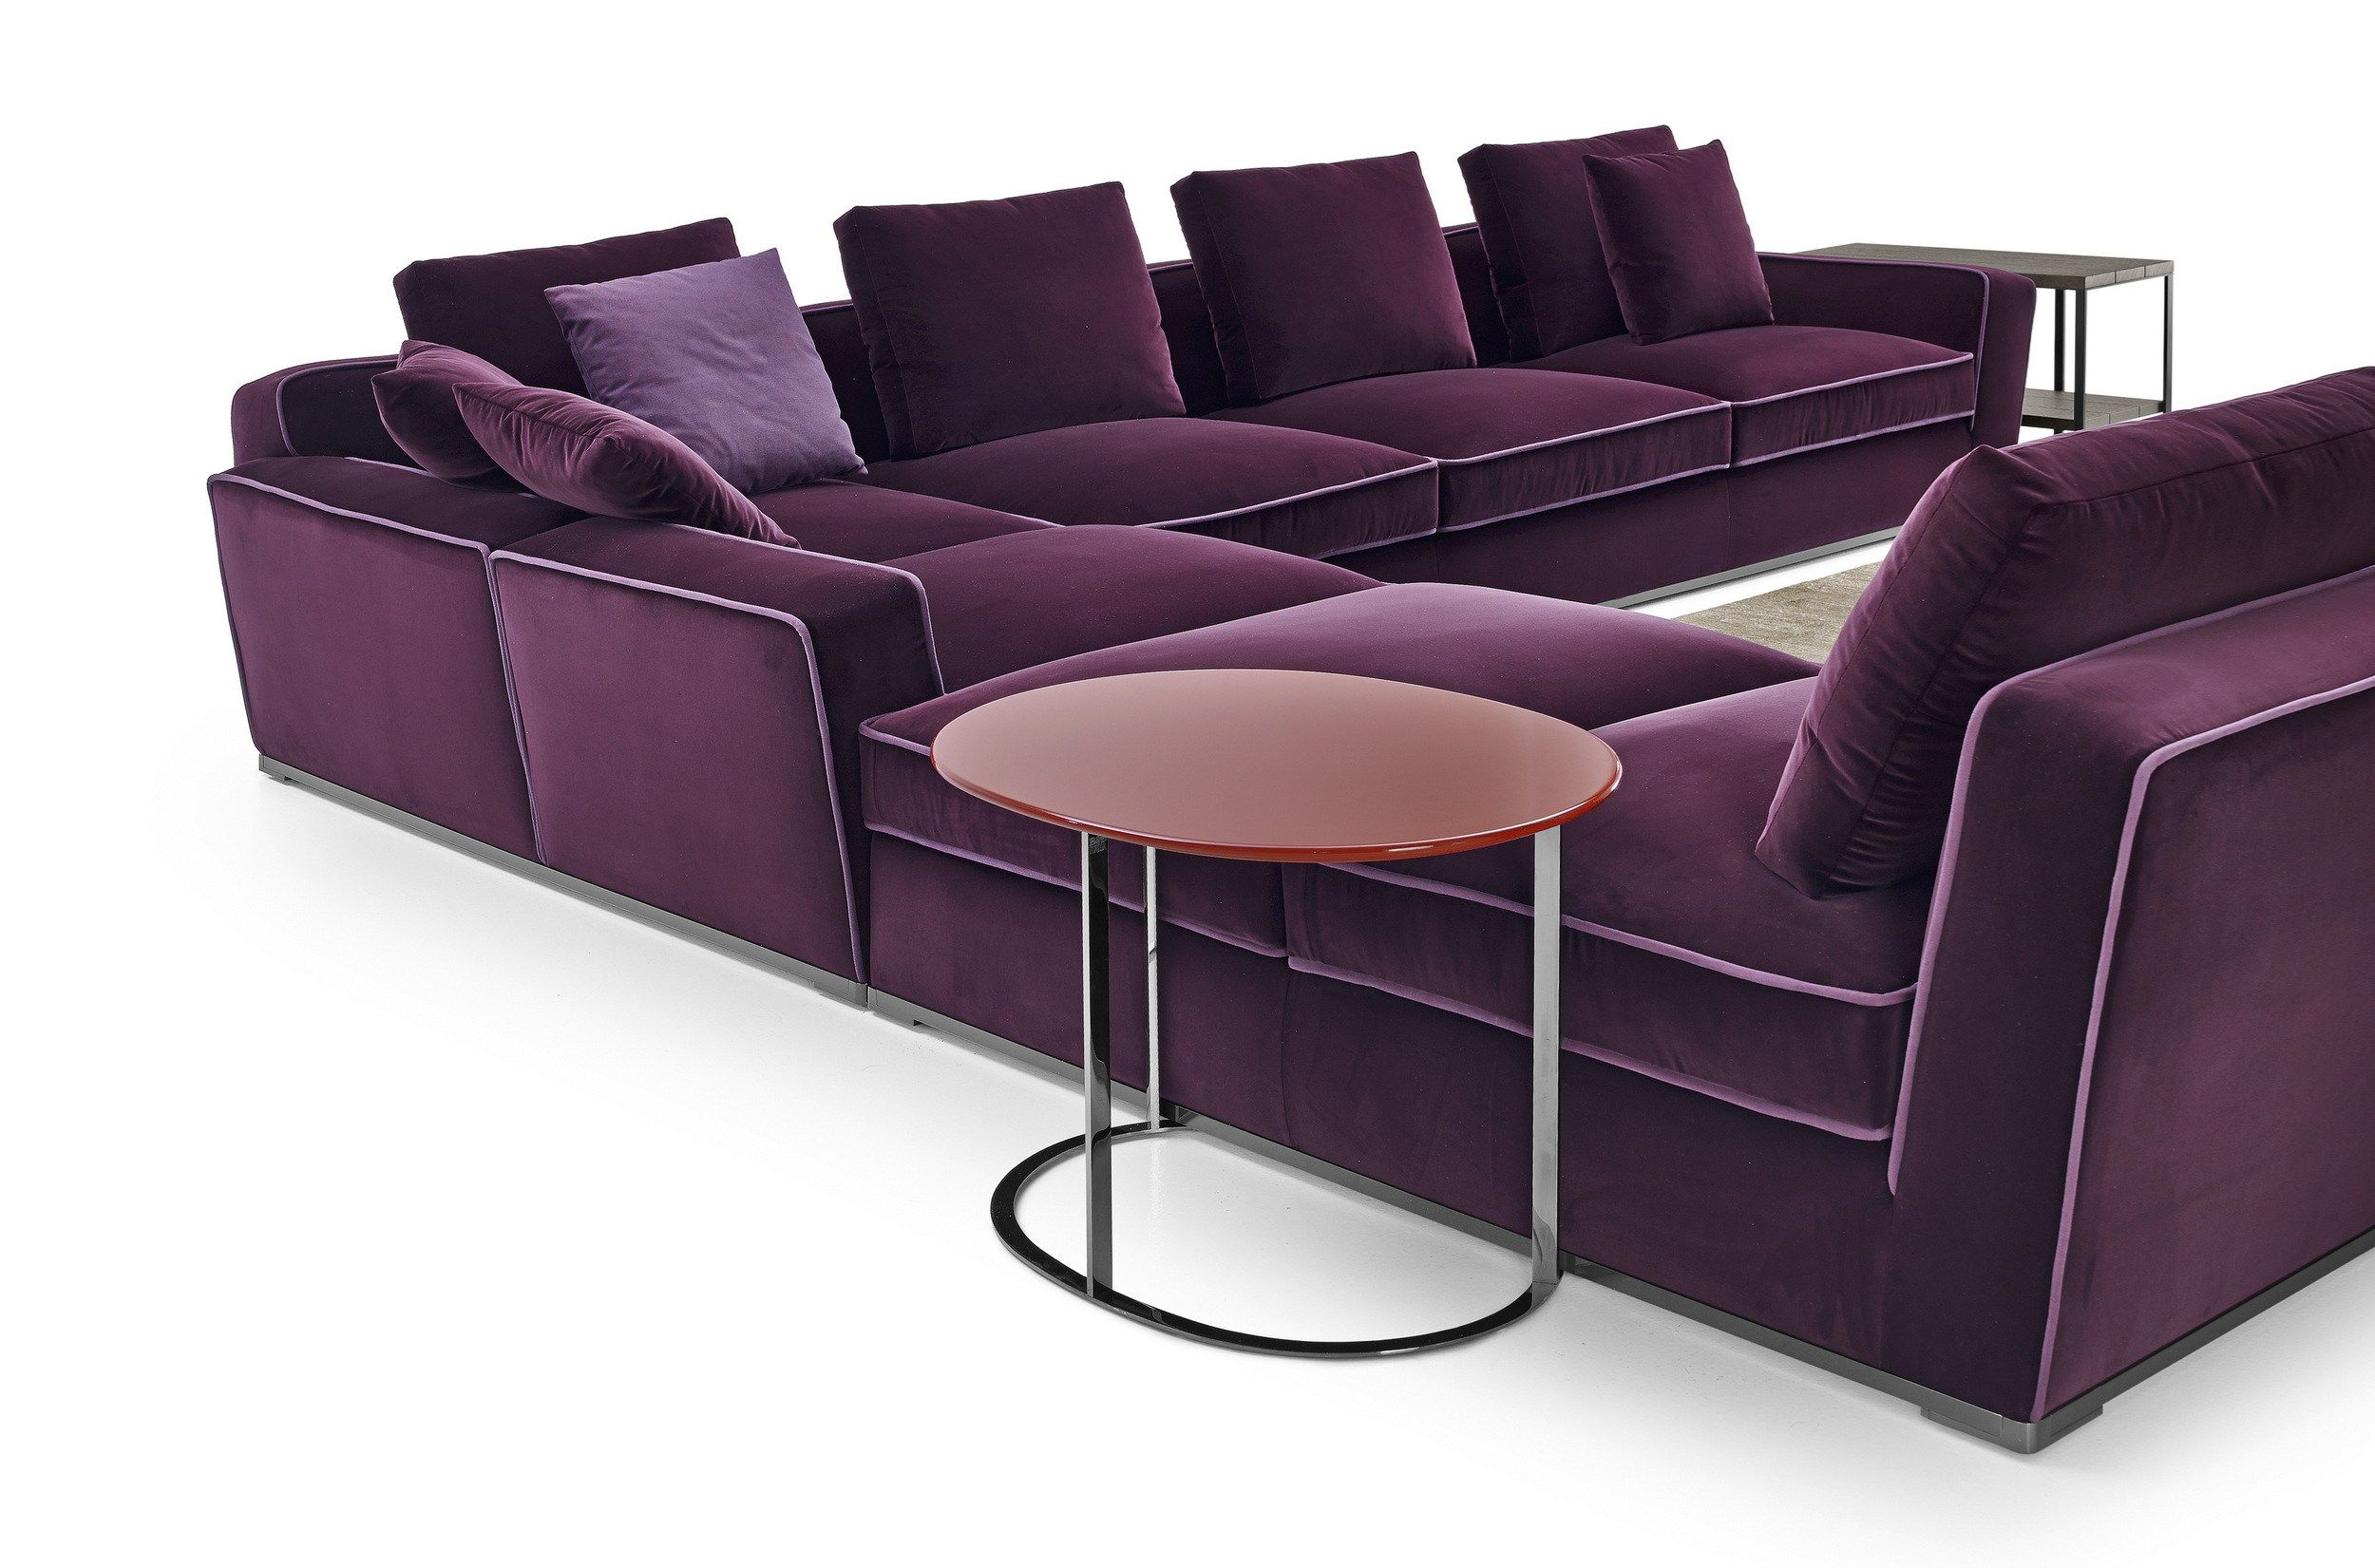 Solatium Modular Sofa By Antonio Citterio For Maxalto Fabric Sofa Design Sofa Modular Sofa